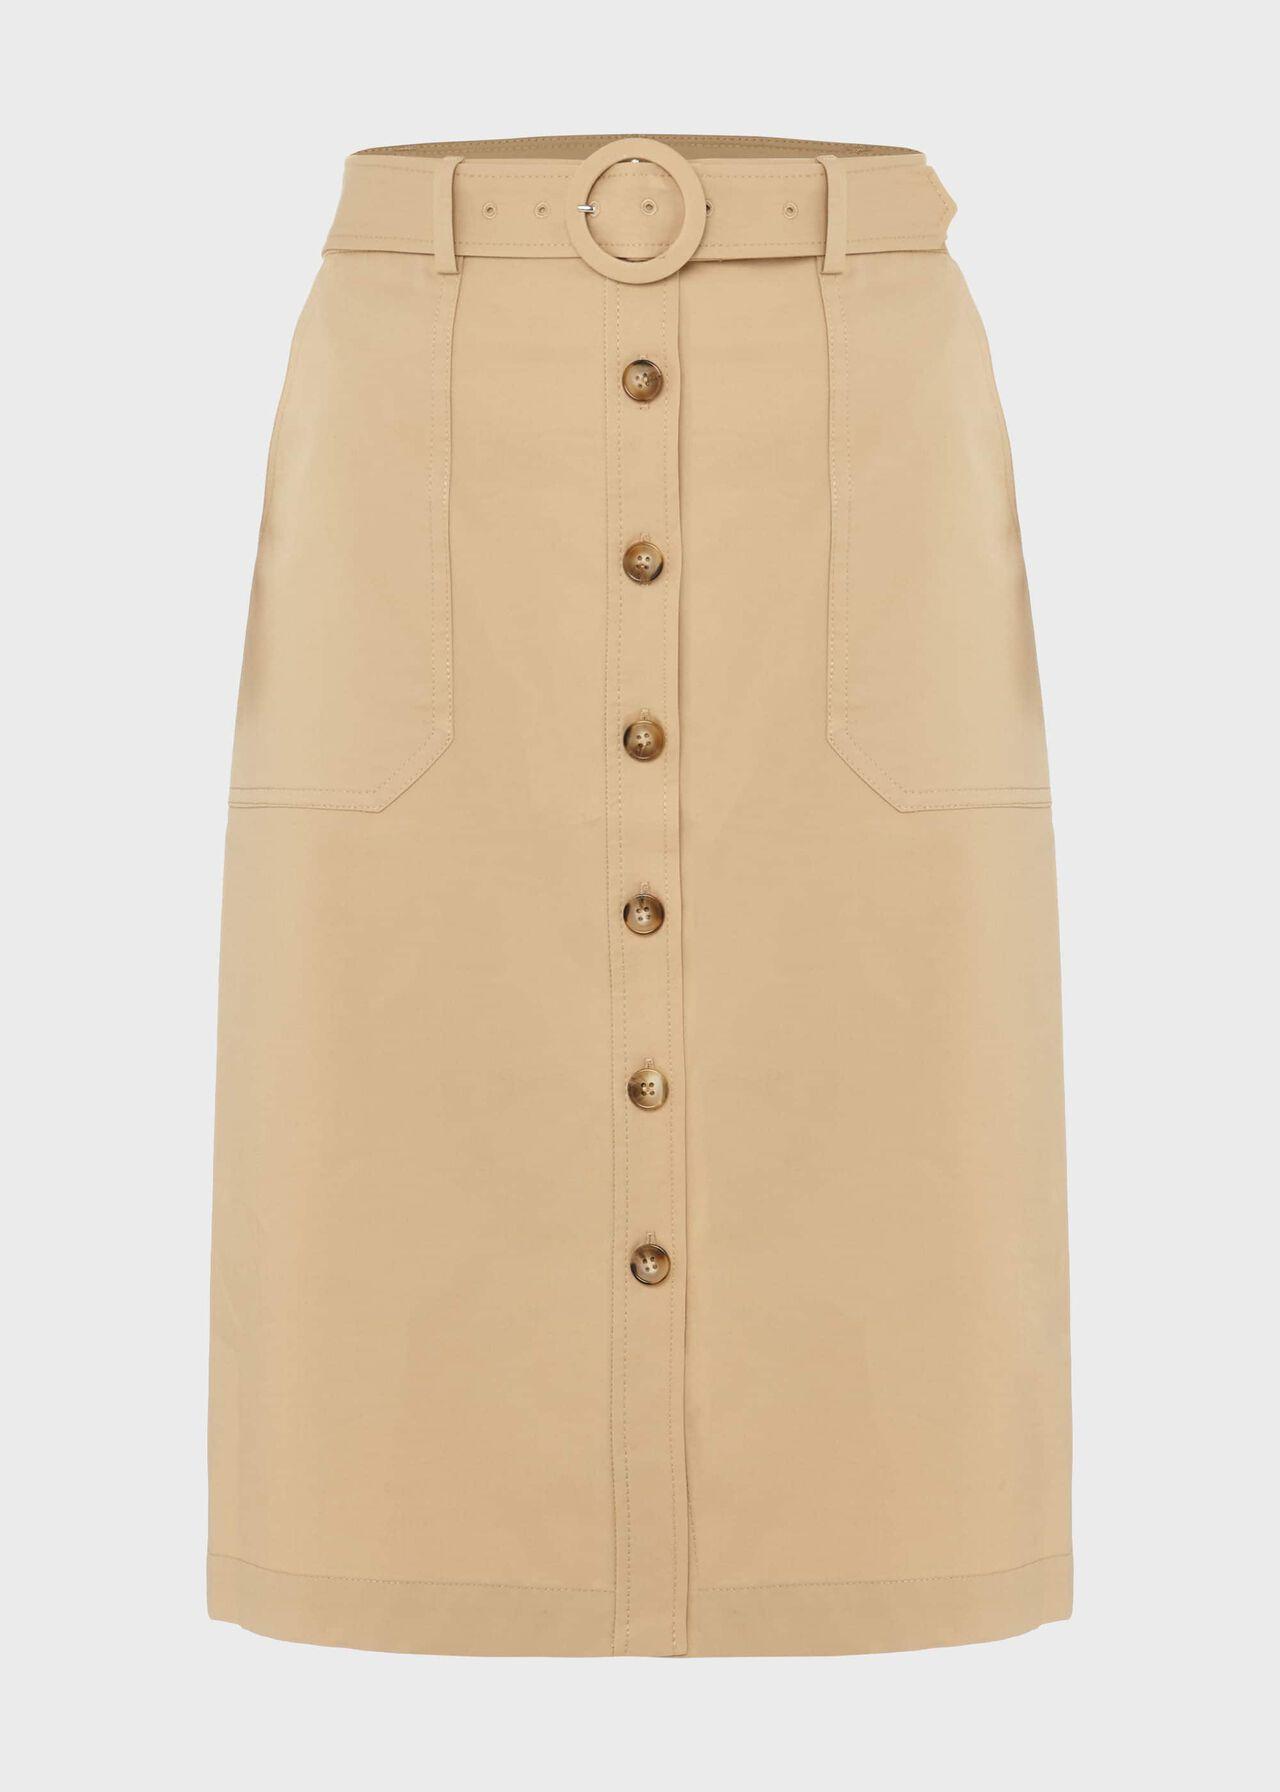 Adaline Skirt Sand